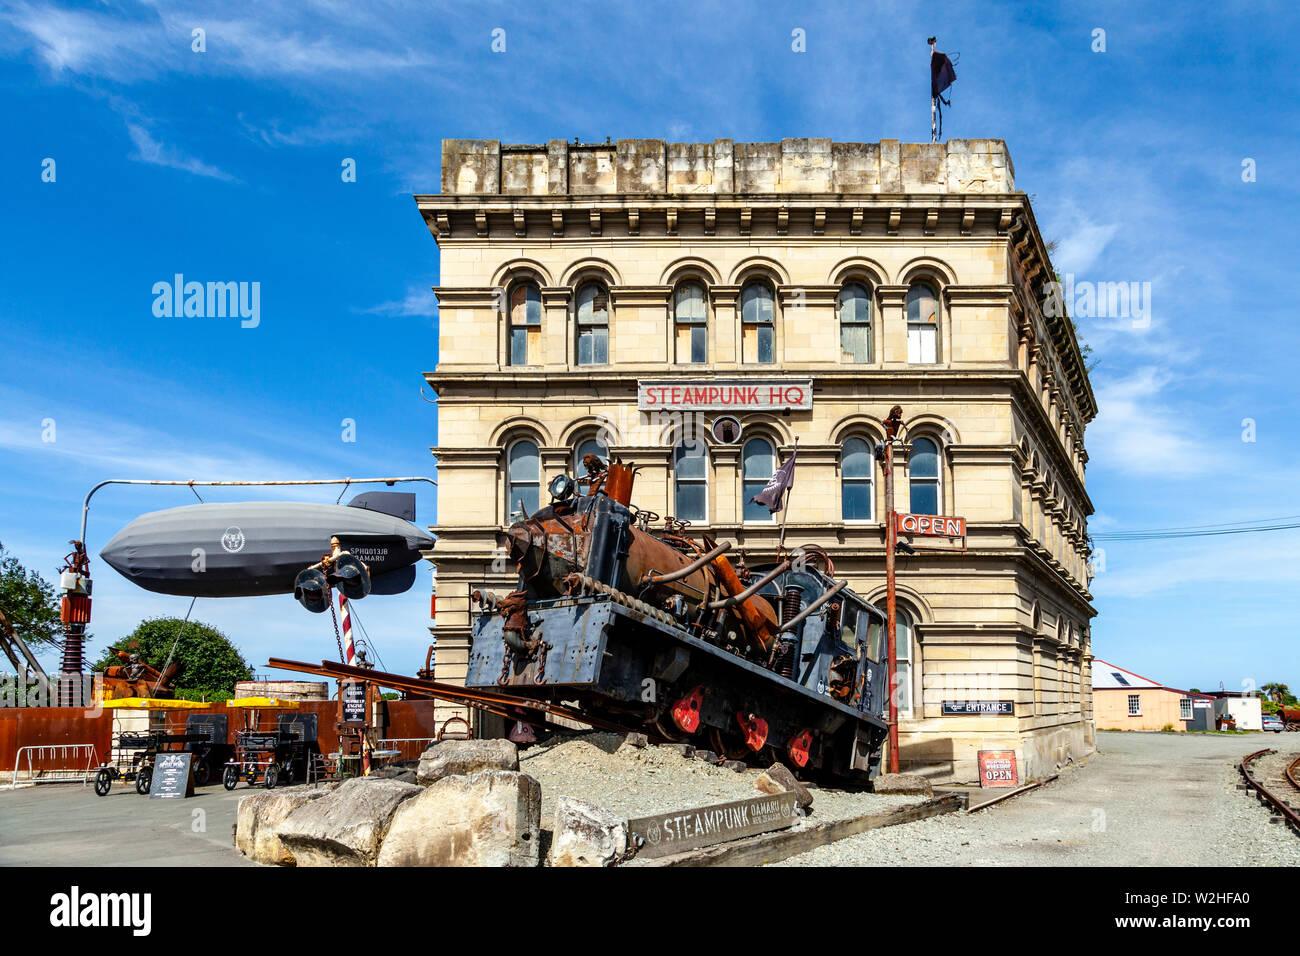 The Steampunk HQ Gallery, Victorian Heritage Precinct, Oamaru, North Otago, South Island, New Zealand - Stock Image